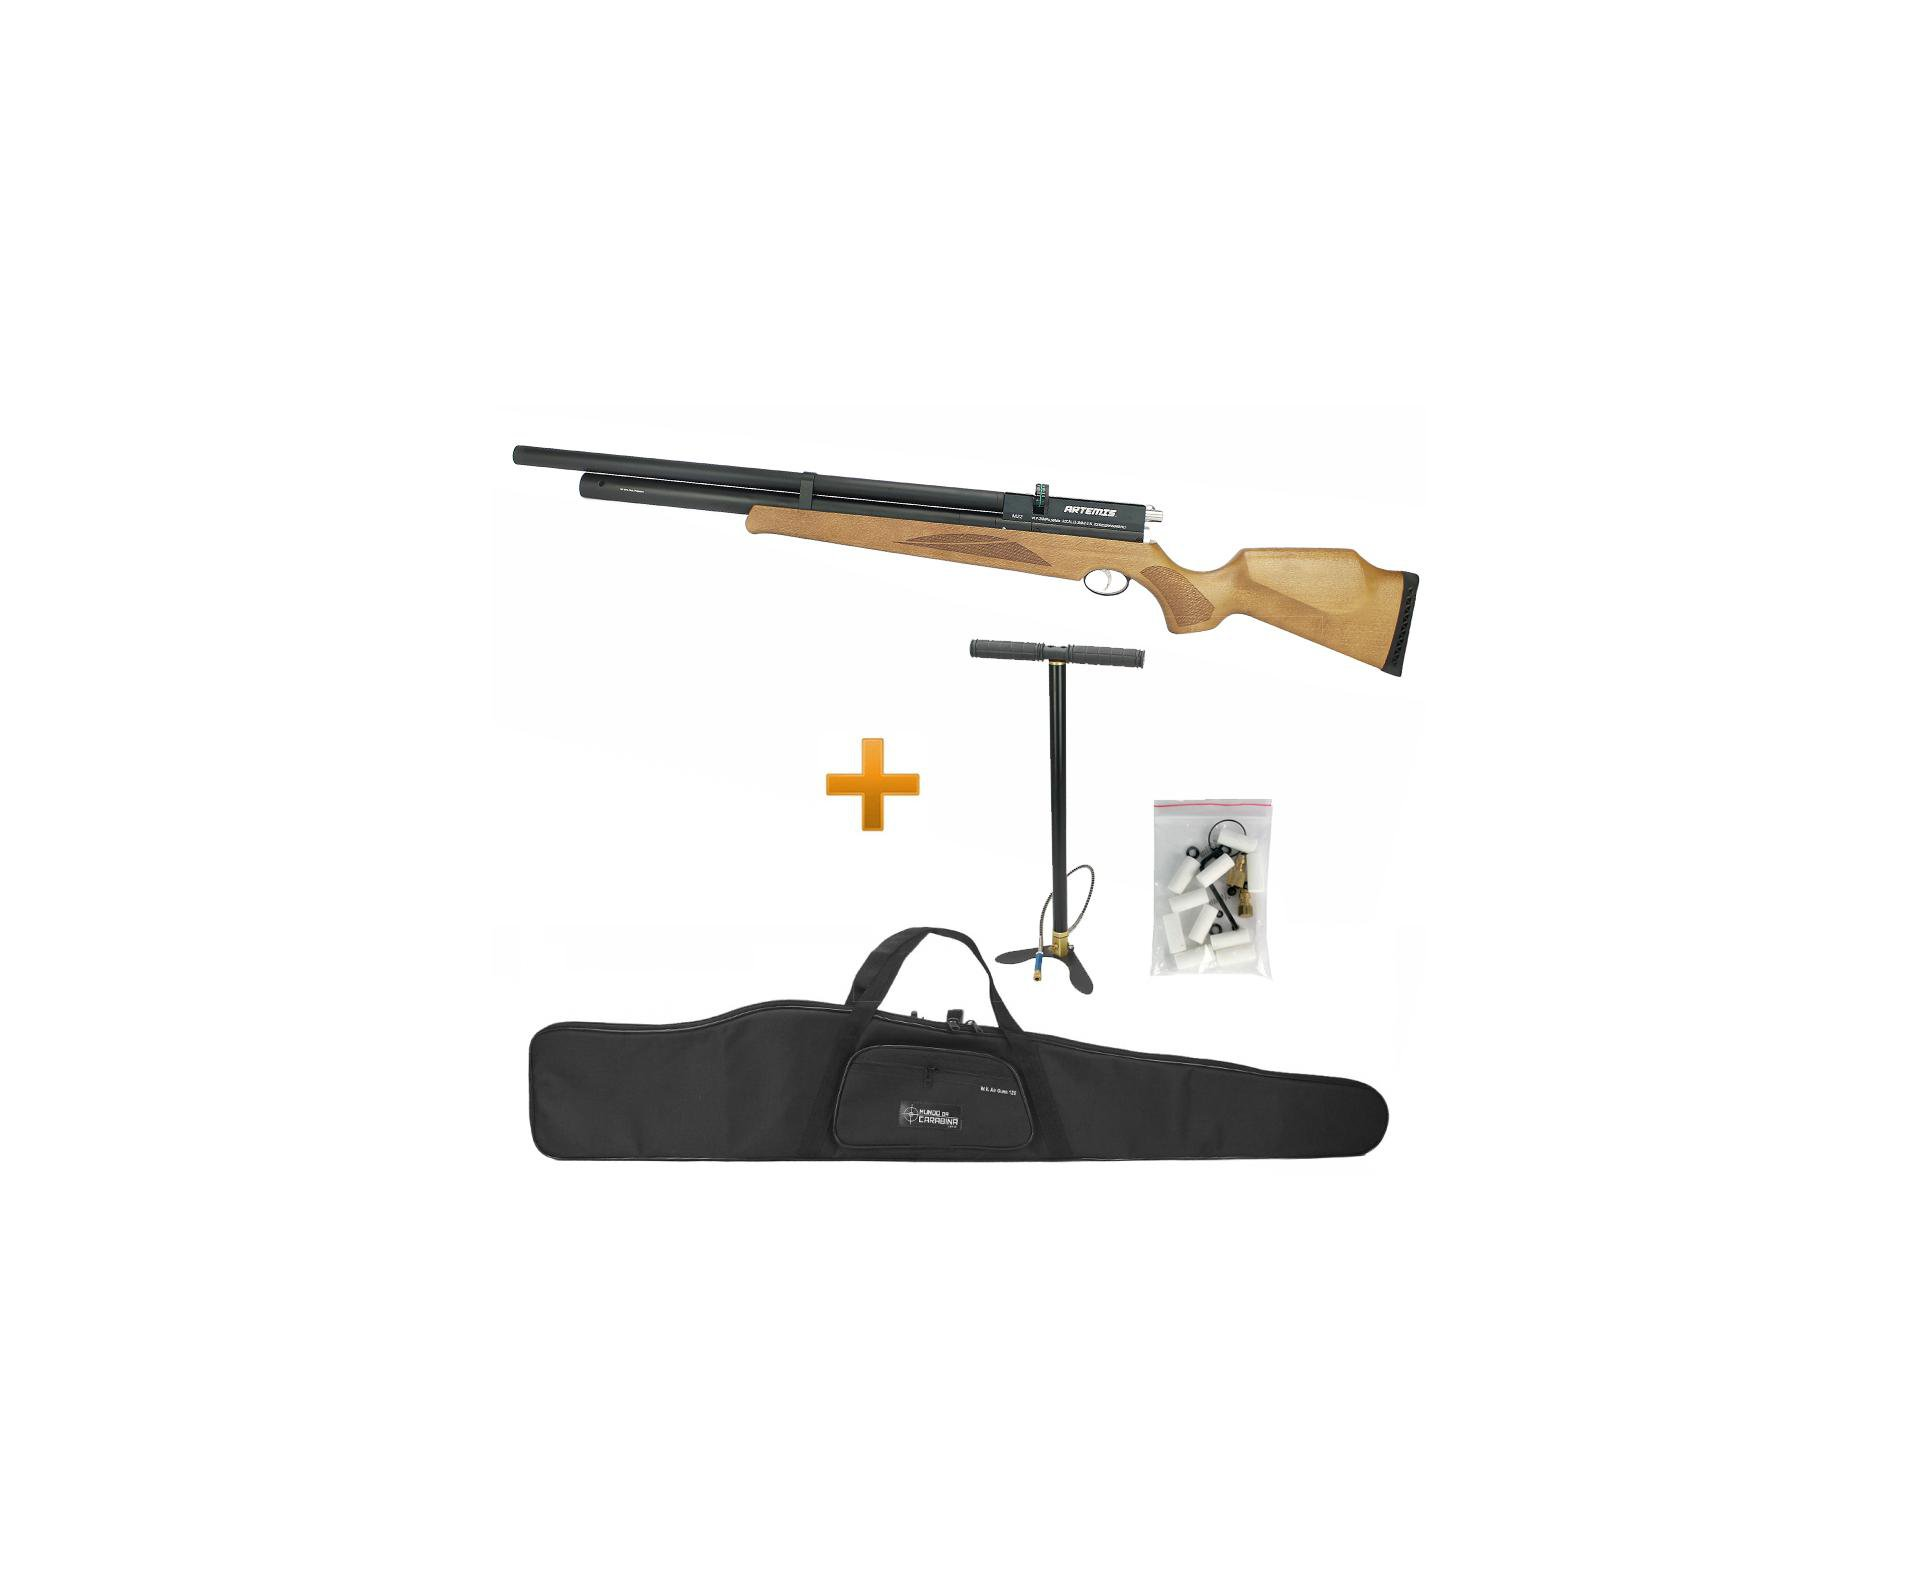 Carabina De Pressão Pcp Artemis M22 11 Tiros 5.5mm + Bomba + Capa